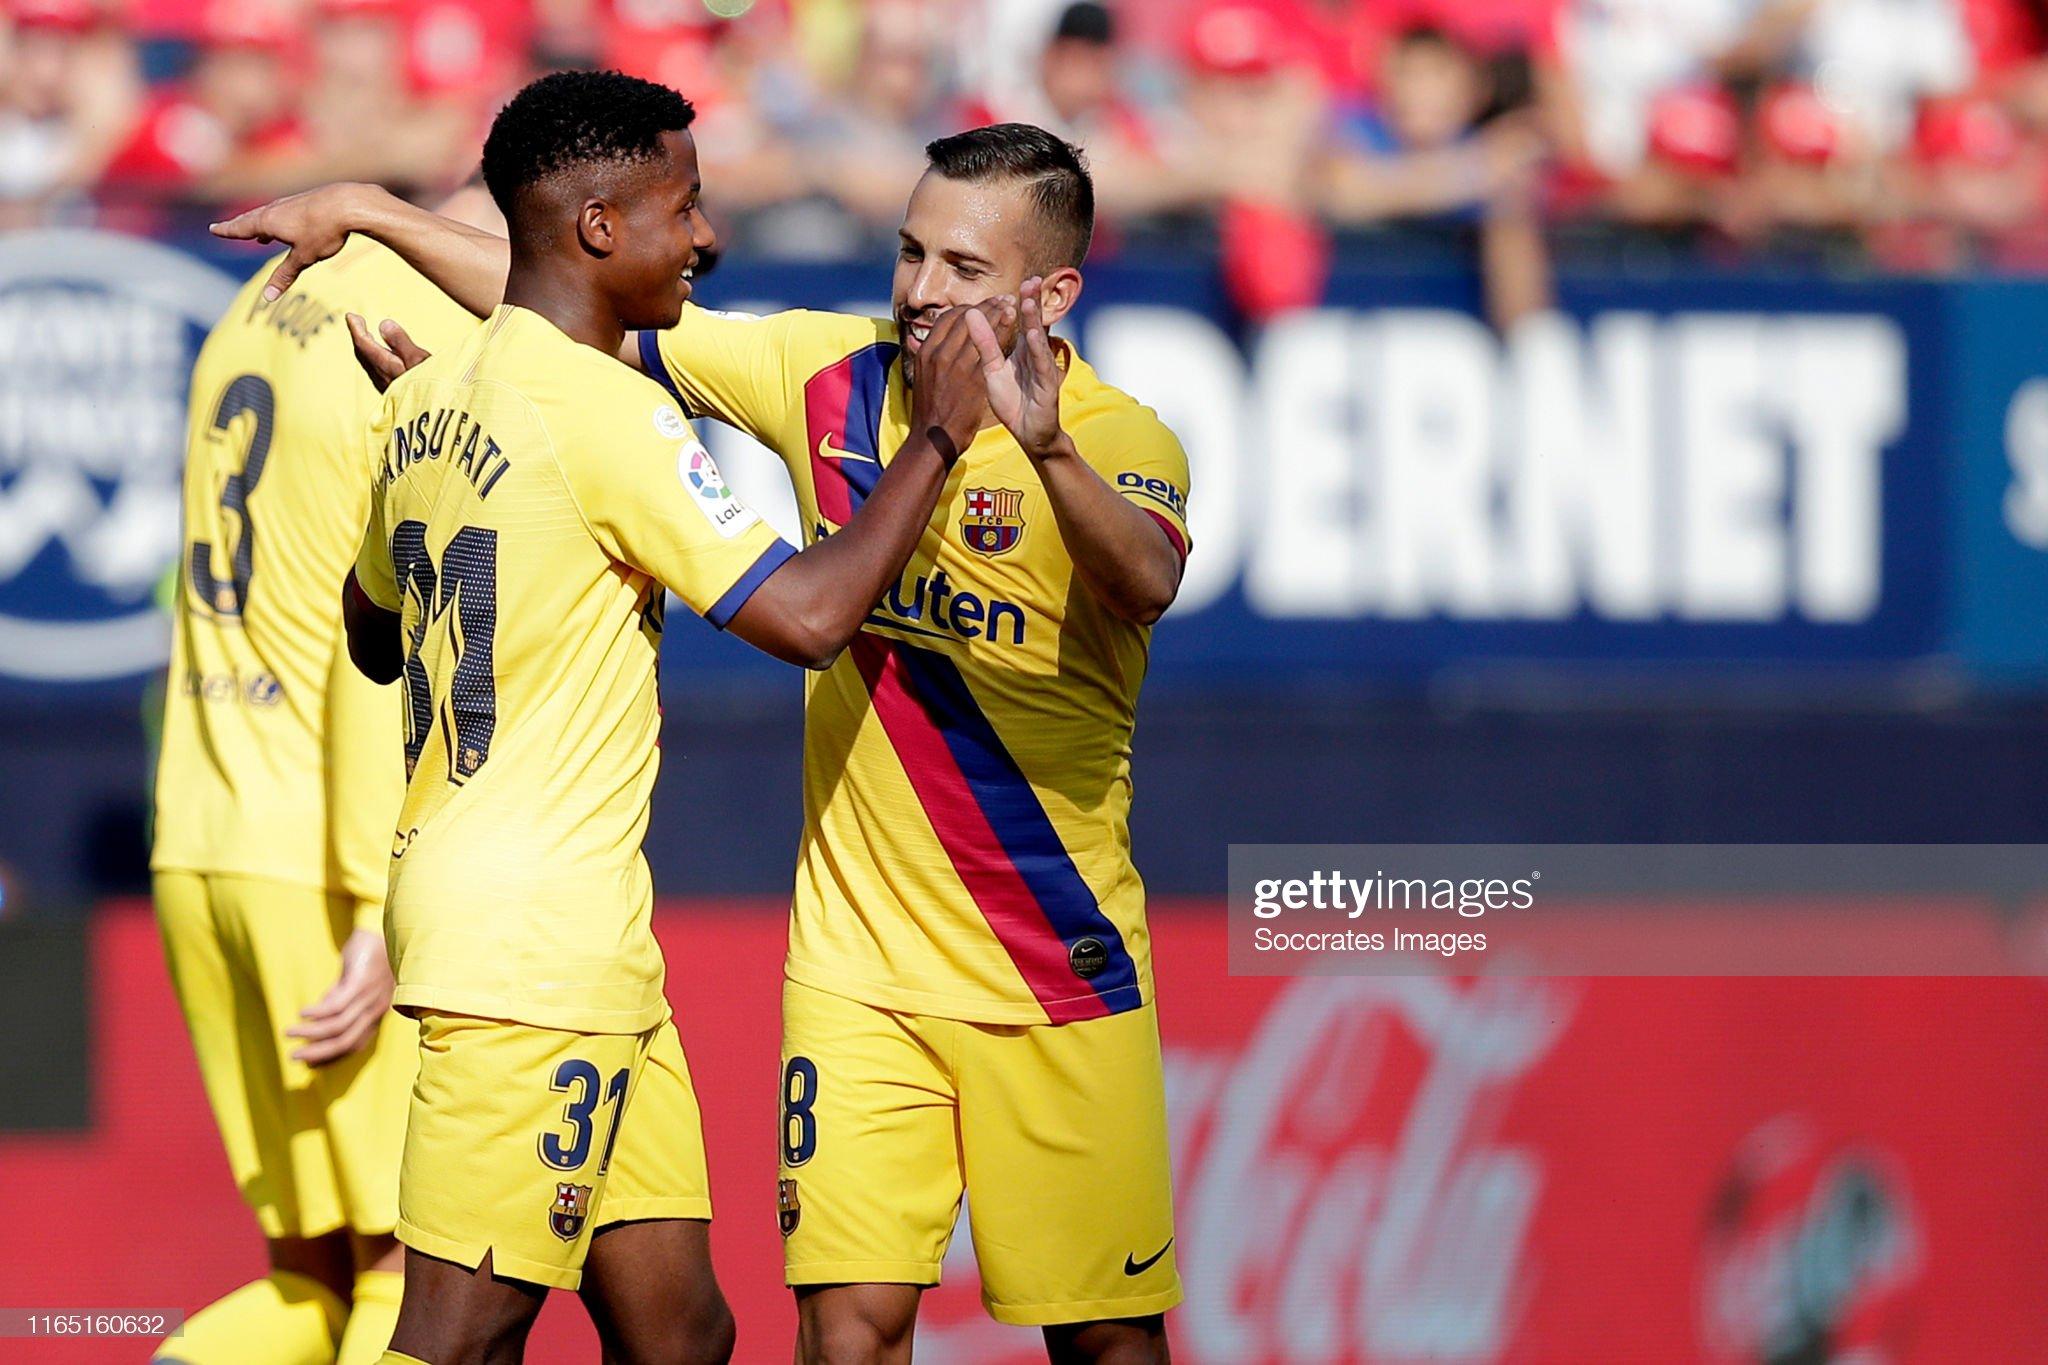 صور مباراة : أوساسونا - برشلونة 2-2 ( 31-08-2019 )  Ansu-fati-of-fc-barcelona-celebrates-with-jordi-alba-of-fc-barcelona-picture-id1165160632?s=2048x2048